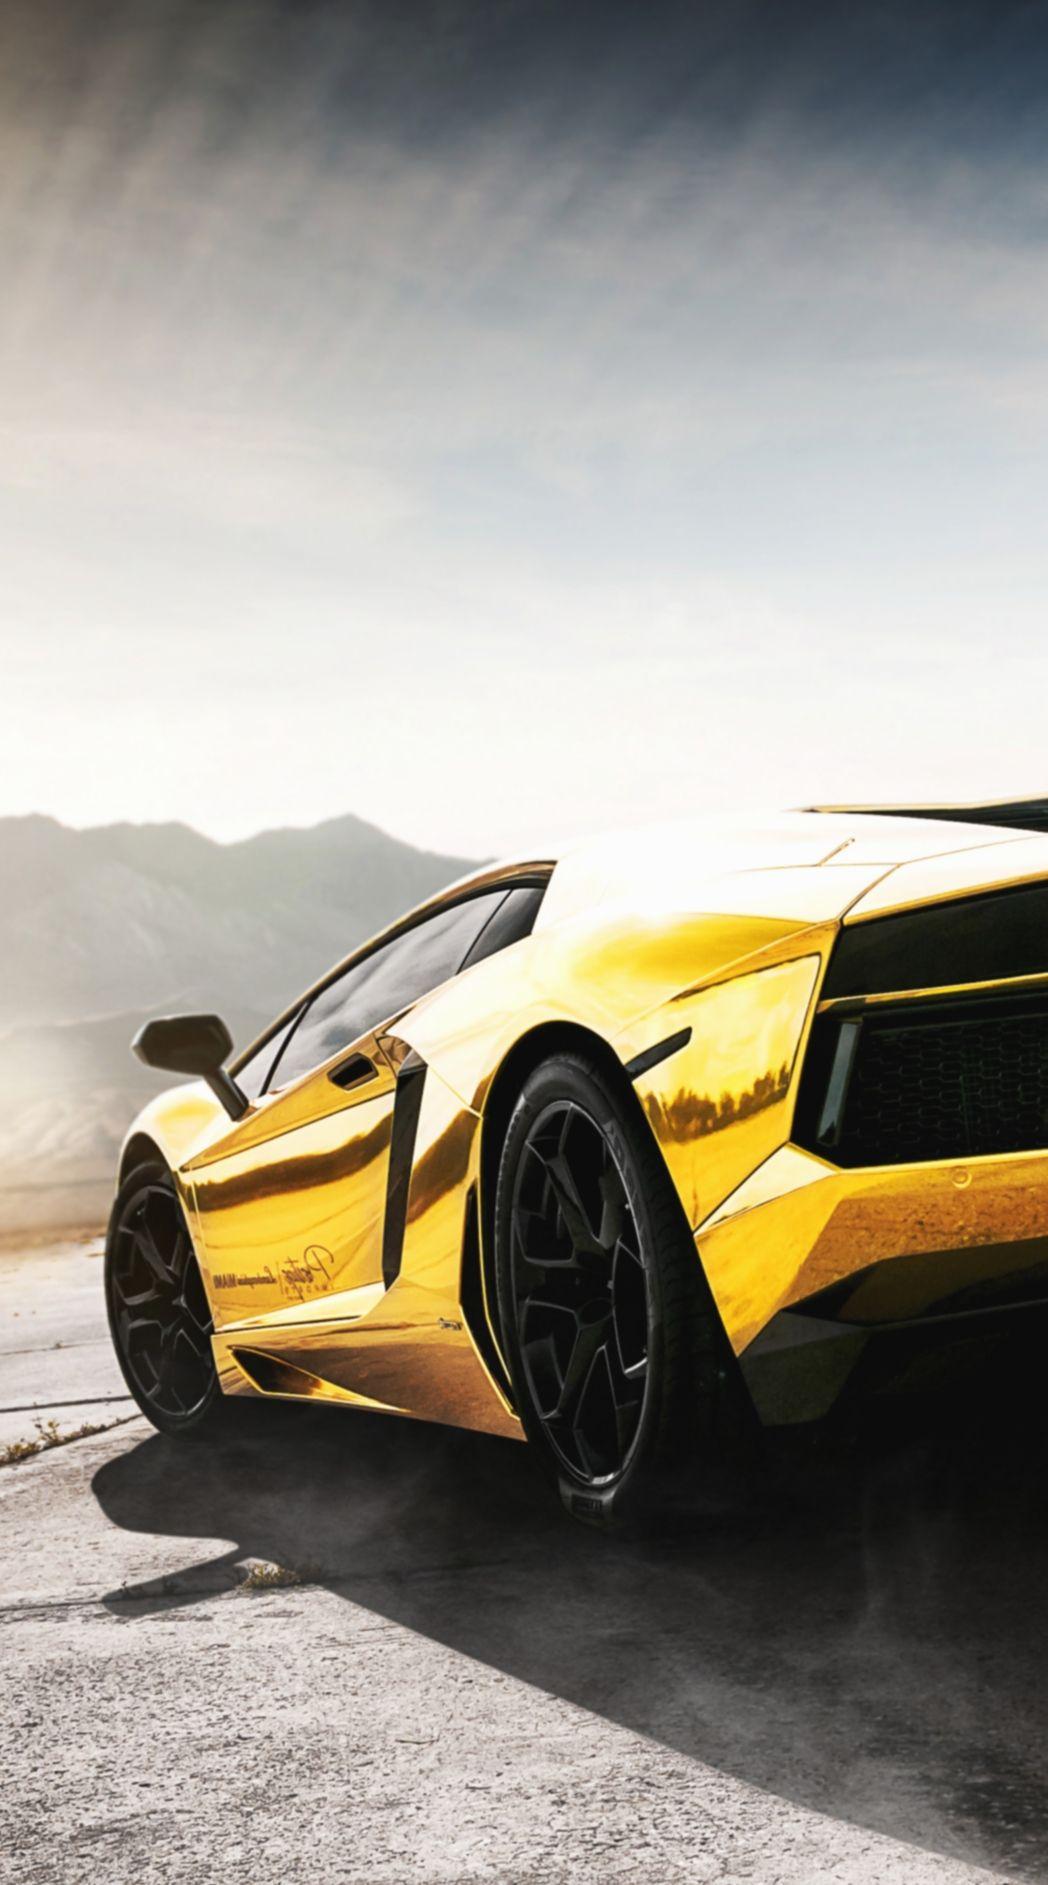 Gold Lamborghini Mobile Hd Wallpaper Car Wallpaper Hd Gold Lamborghini Hd Wallpaper Lamborghini